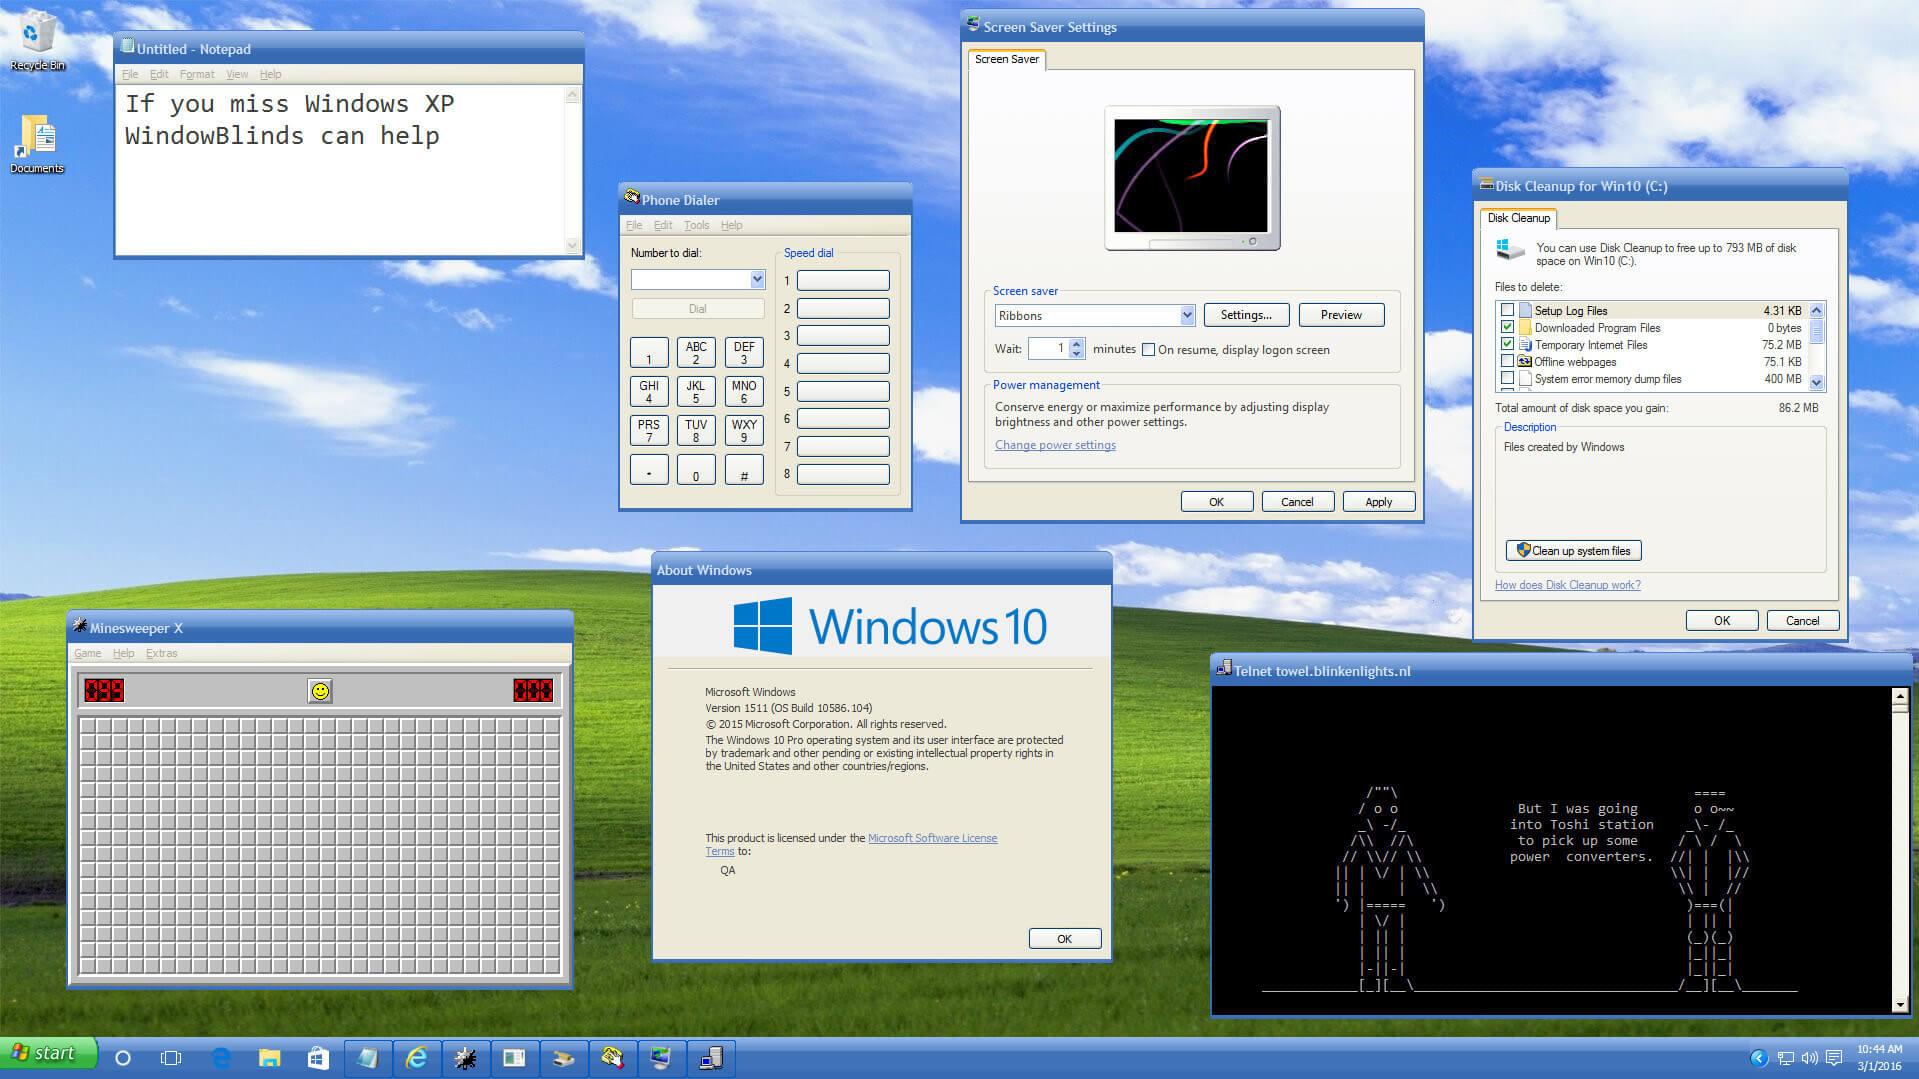 Windowblinds 10.82 Activision Code